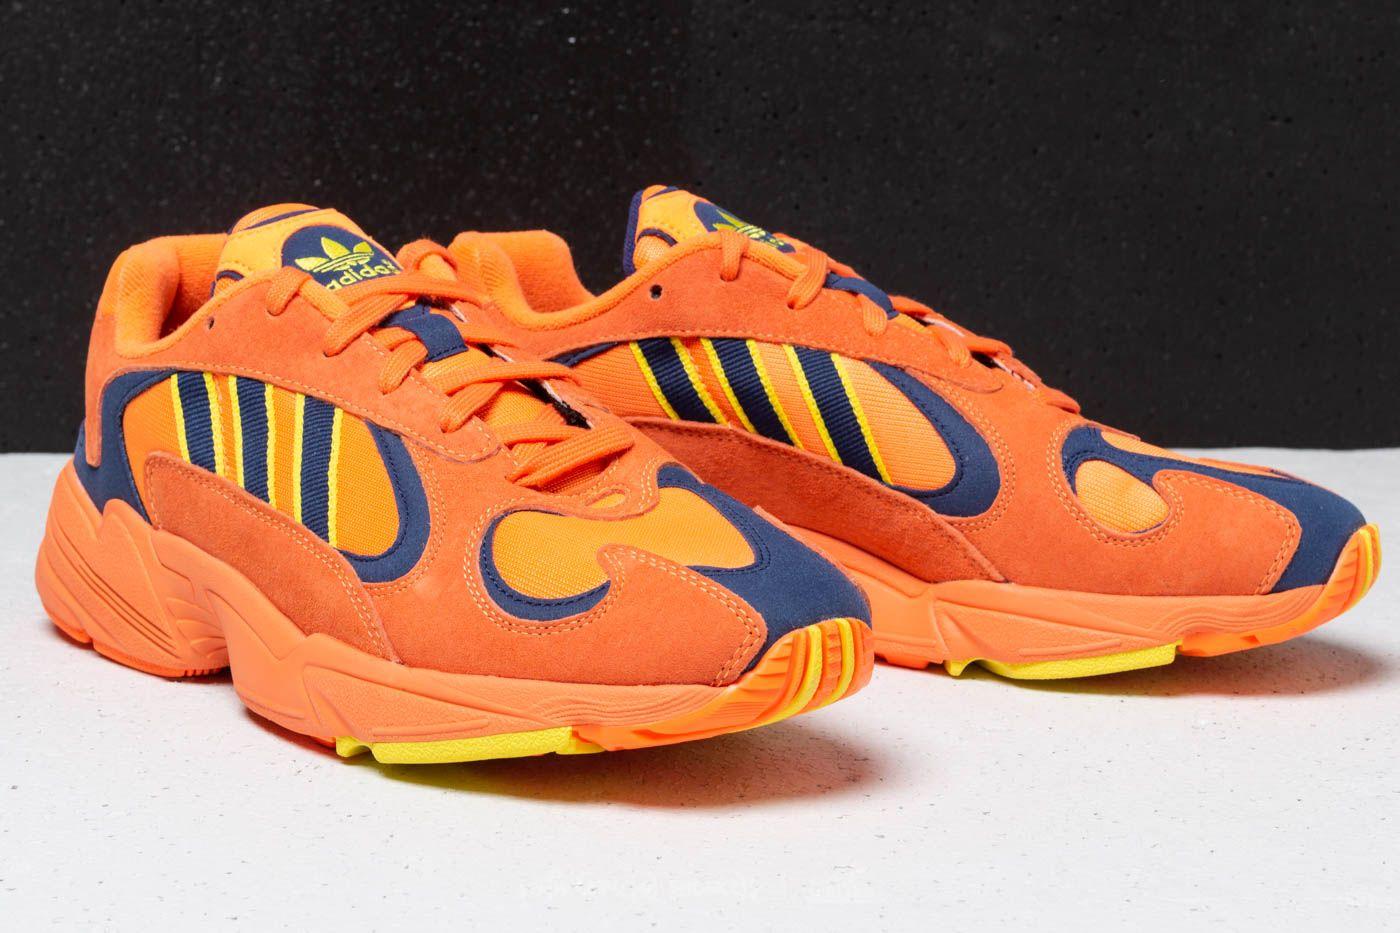 adidas Yung 1 Hi-Res Orange  Hi-Res Orange  Shock Yellow at 683e433a87